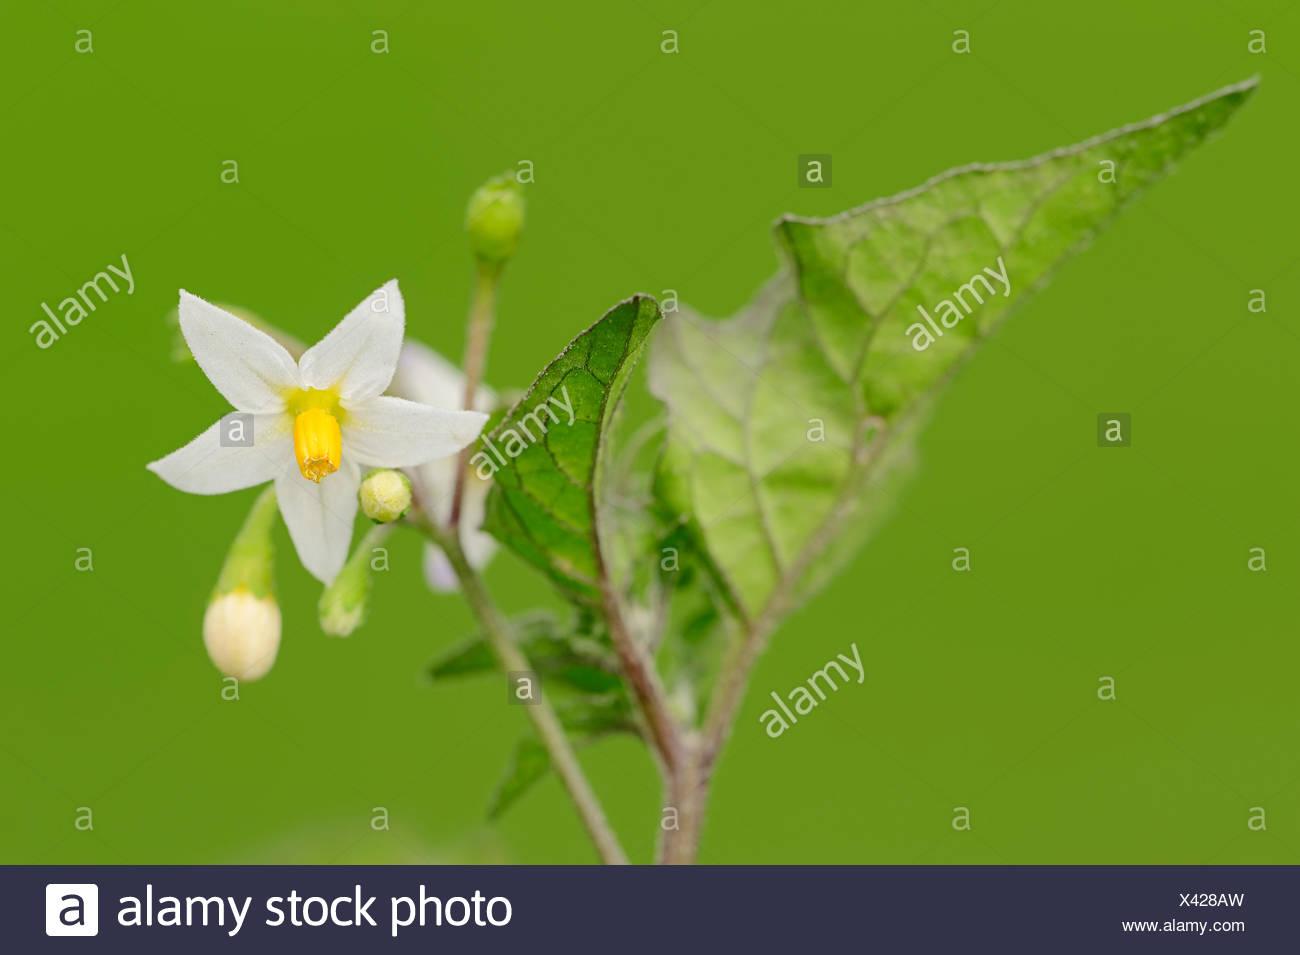 European Black Nightshade, Duscle or Hound's Berry (Solanum nigrum), flower, North Rhine-Westphalia, Germany - Stock Image